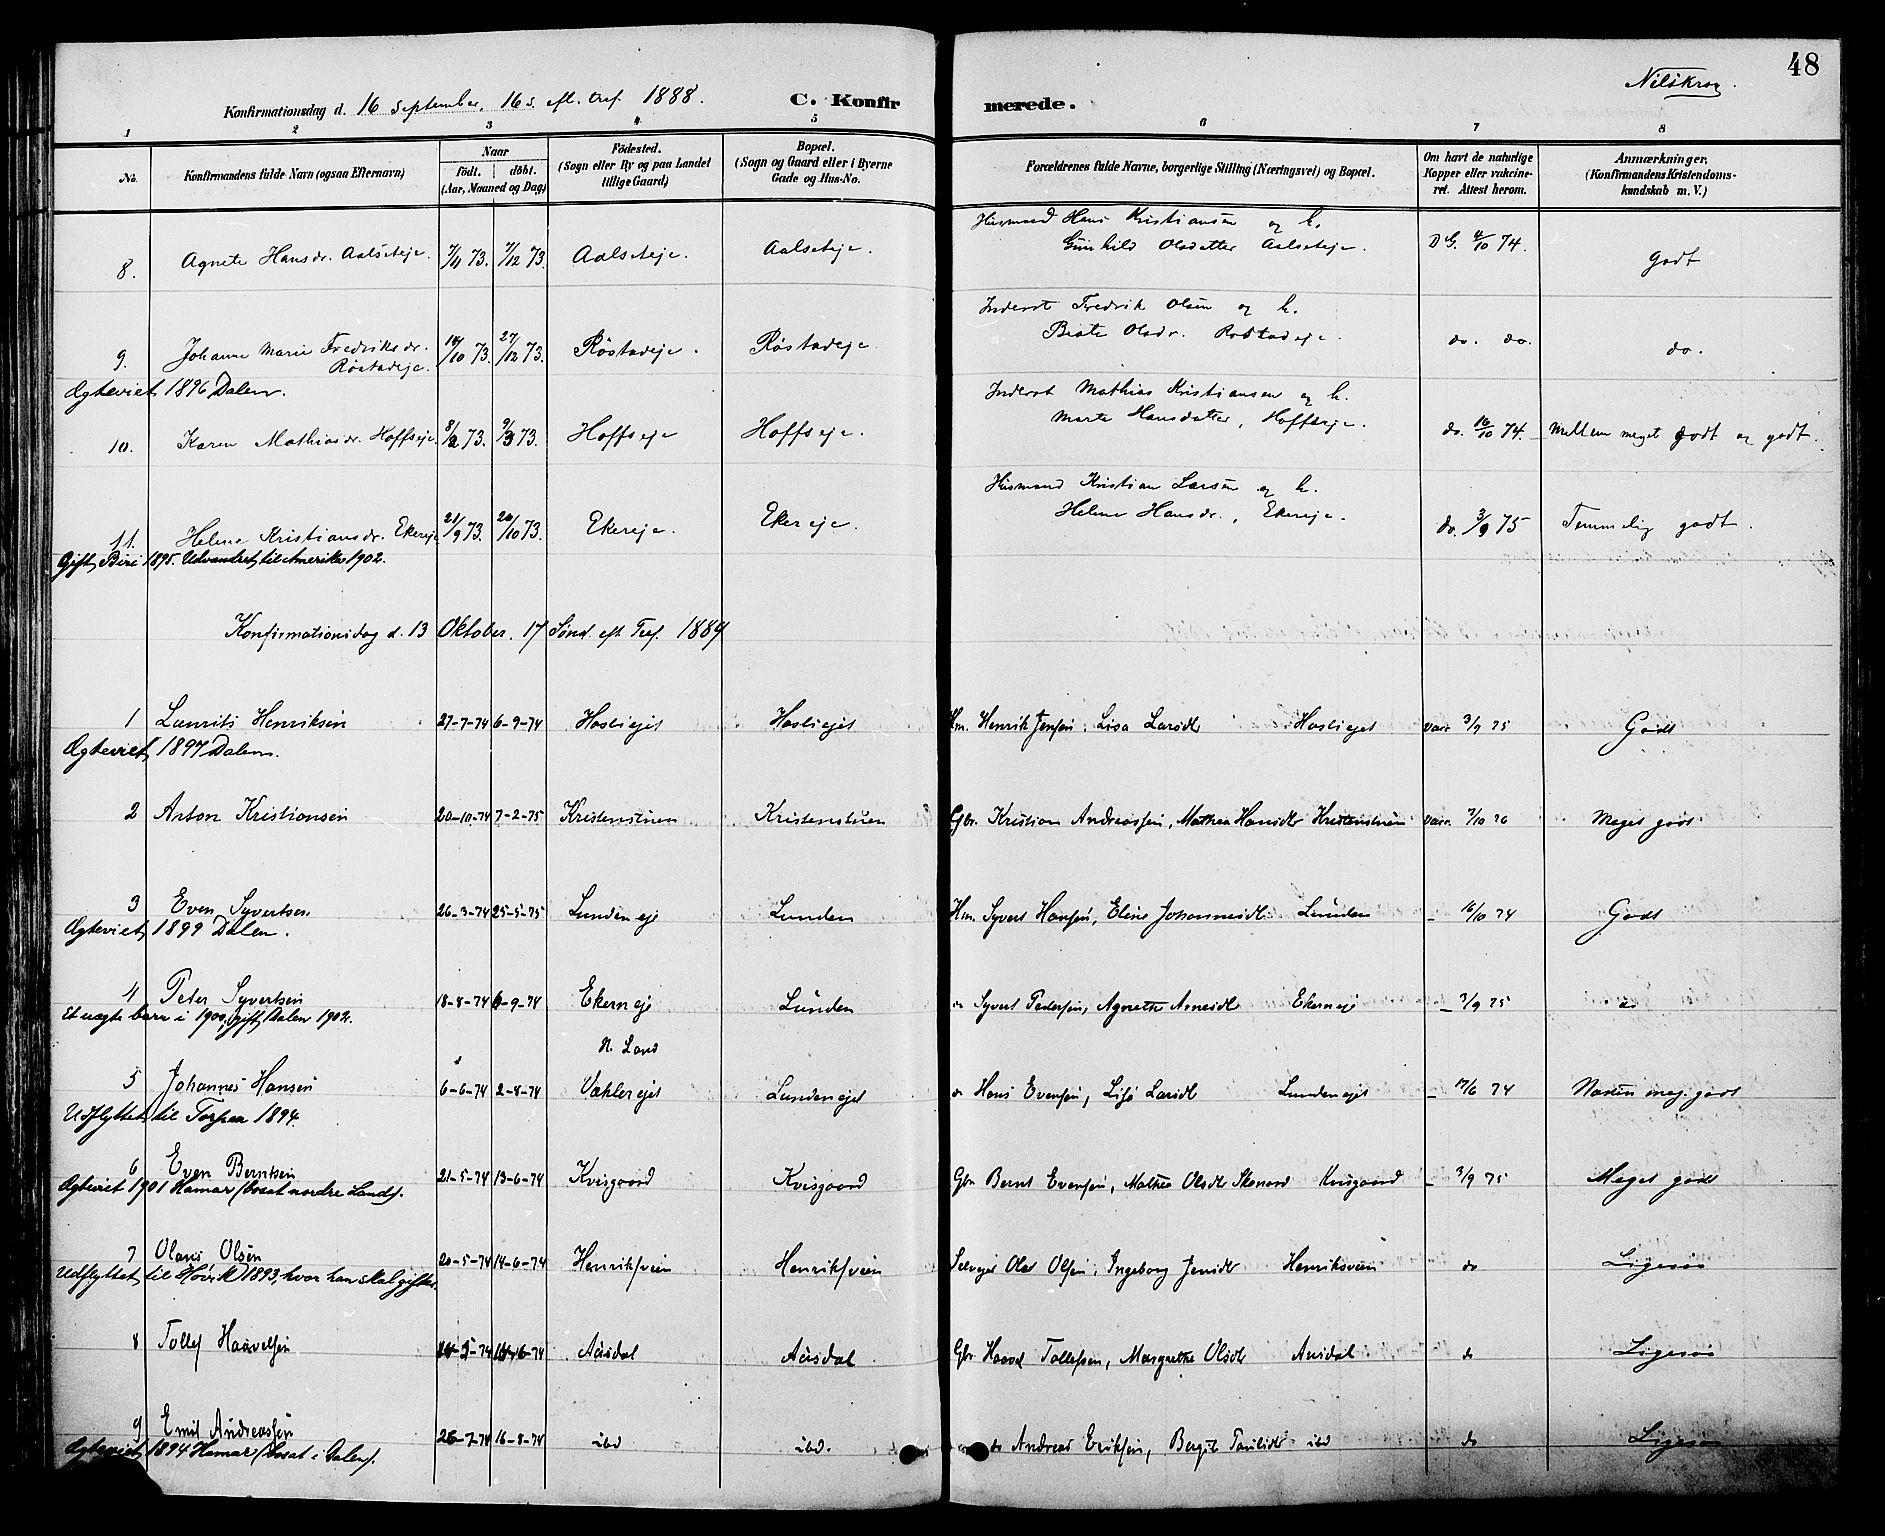 SAH, Biri prestekontor, Ministerialbok nr. 7, 1887-1893, s. 48